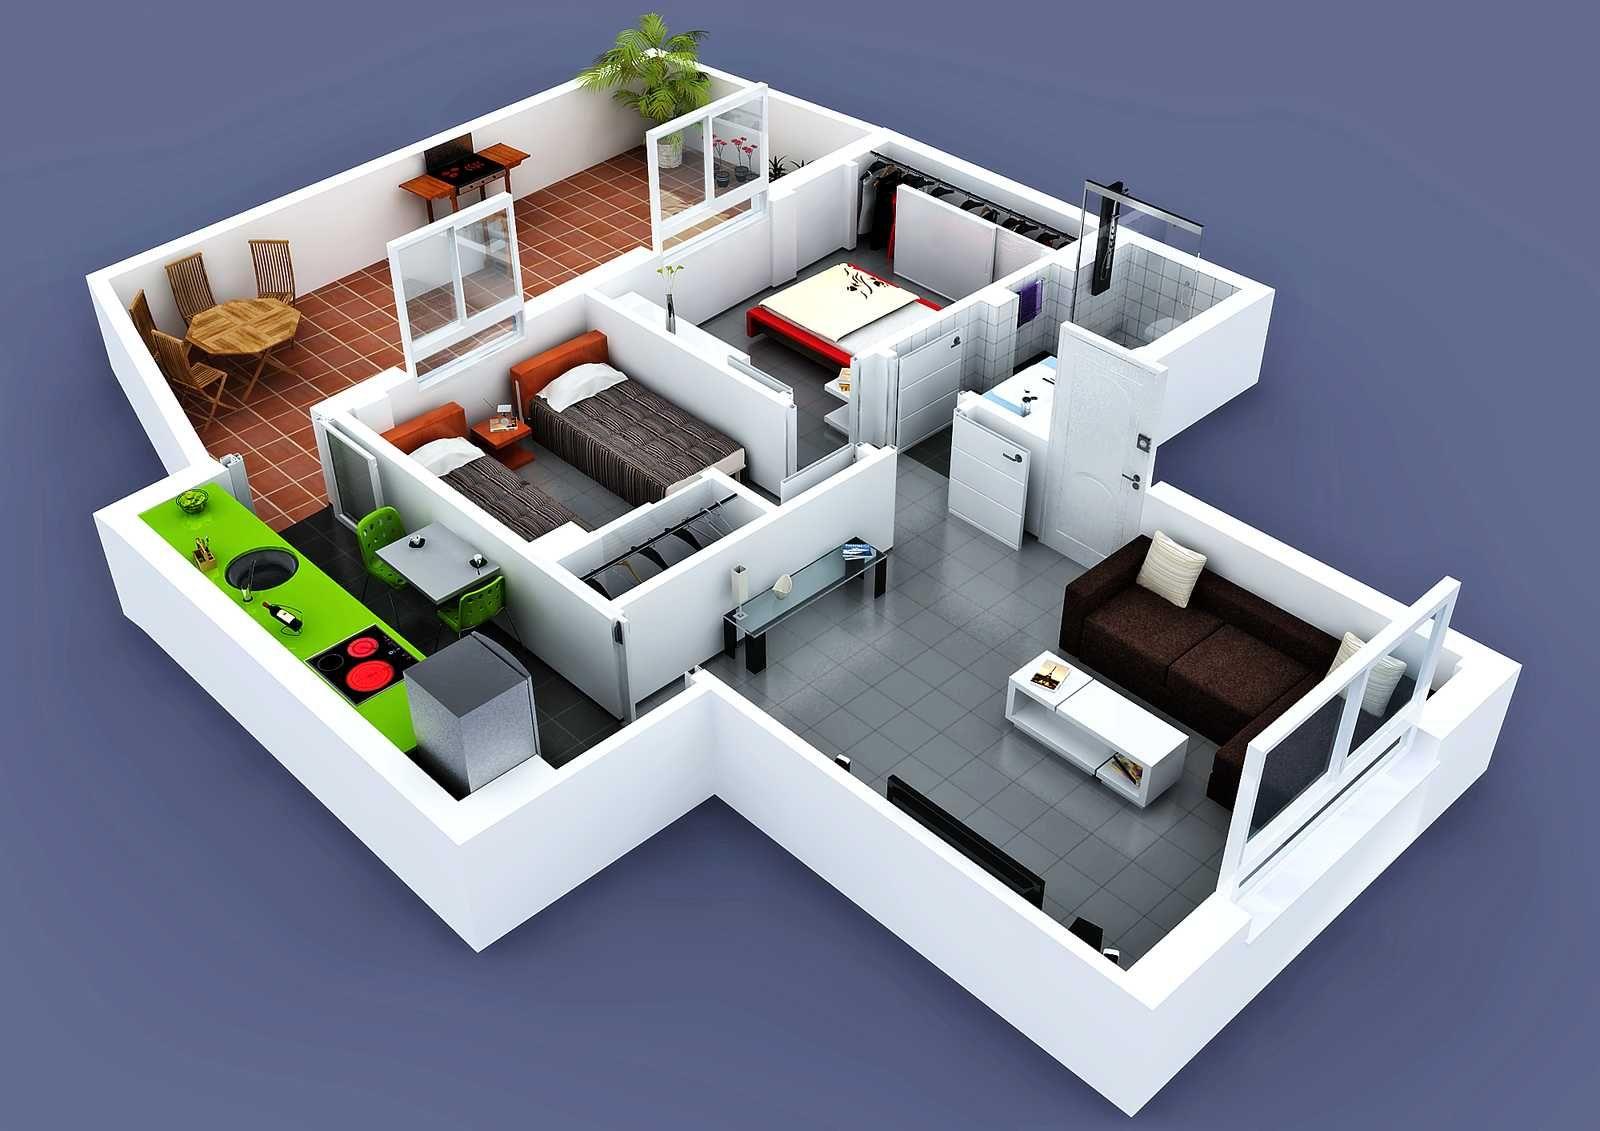 Planos 3d casas buscar con google la casa de mis for Planos google